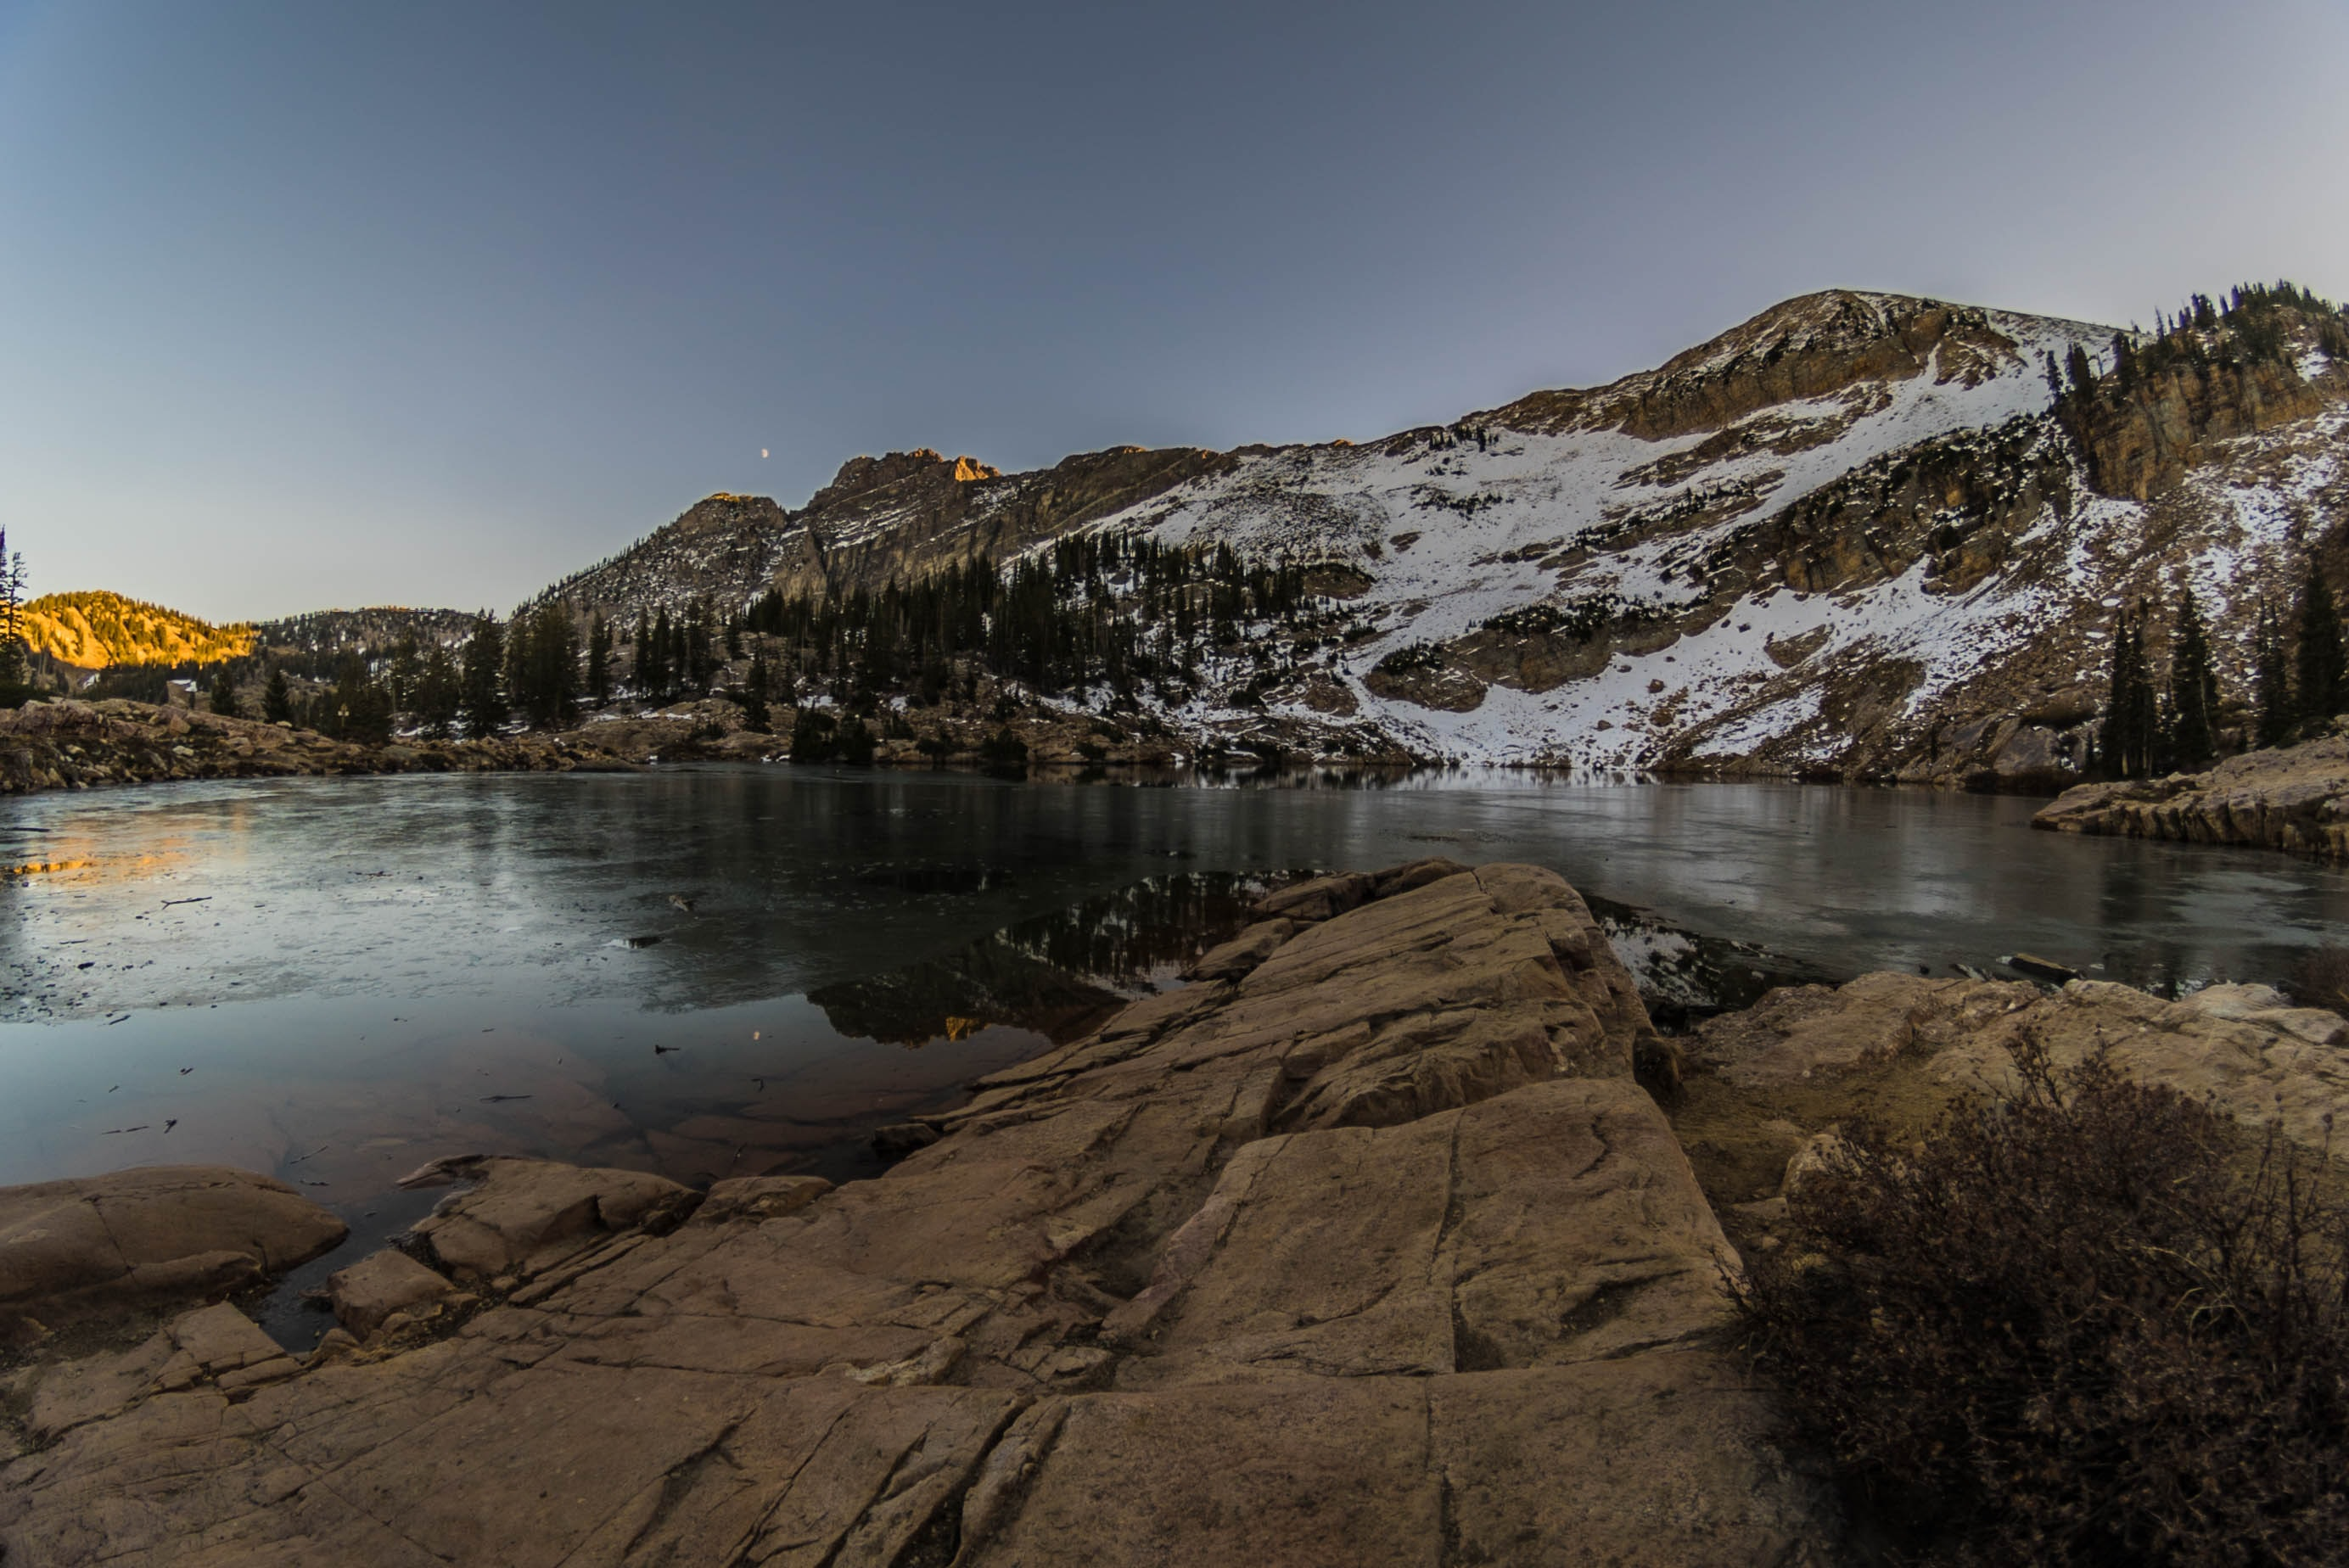 rockformation near lake under white sky